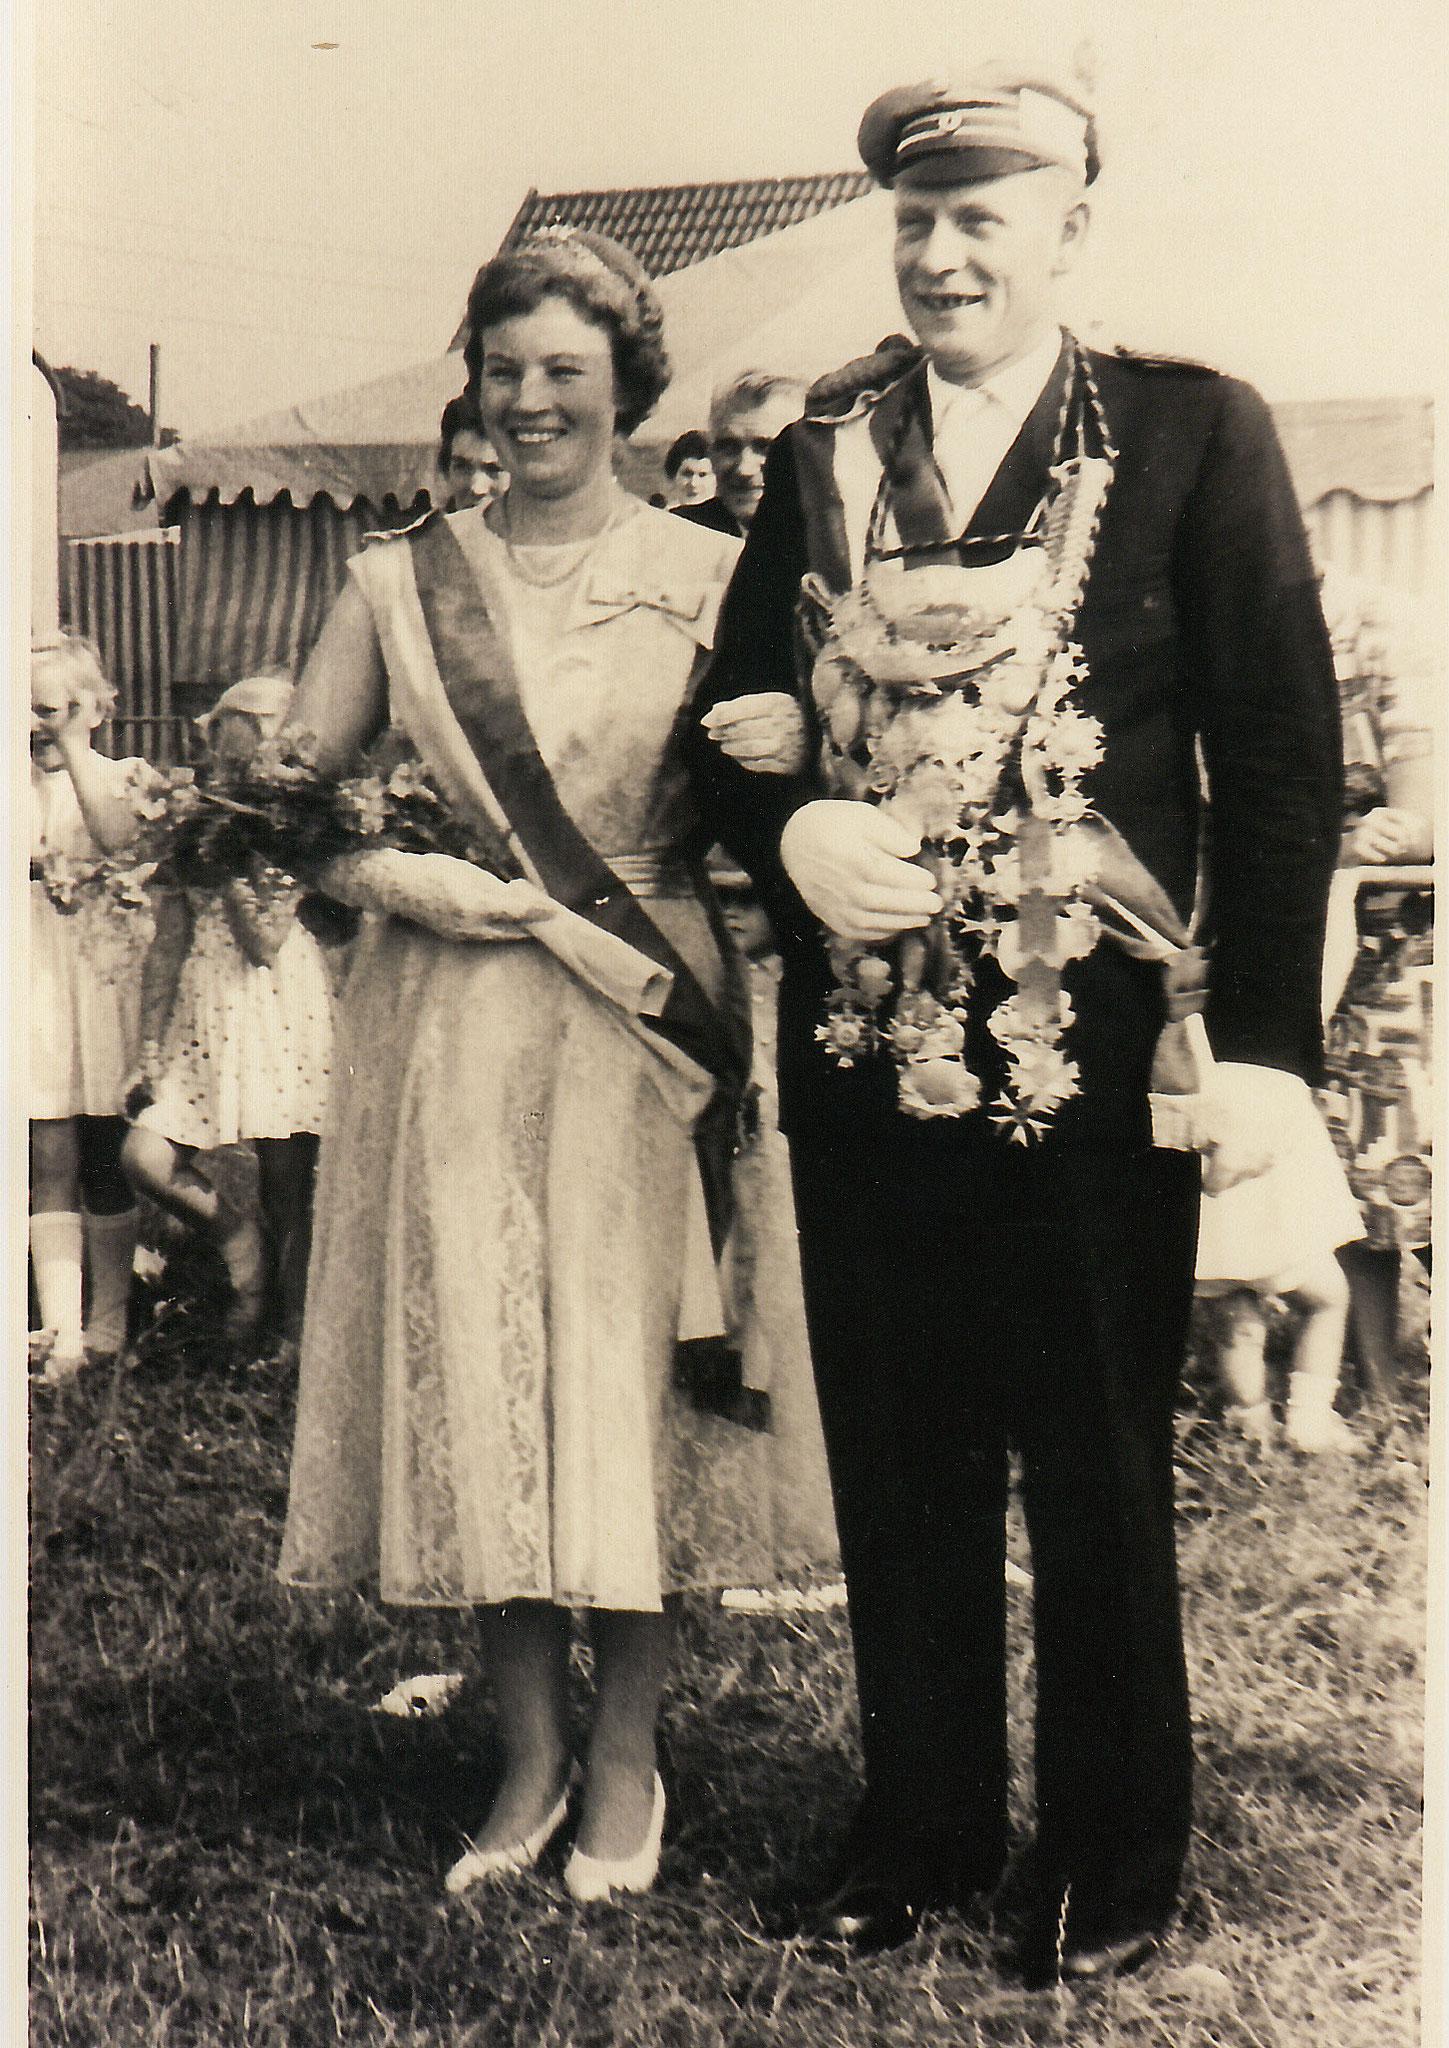 1962 Josef Ellies+ & Anni Mense+